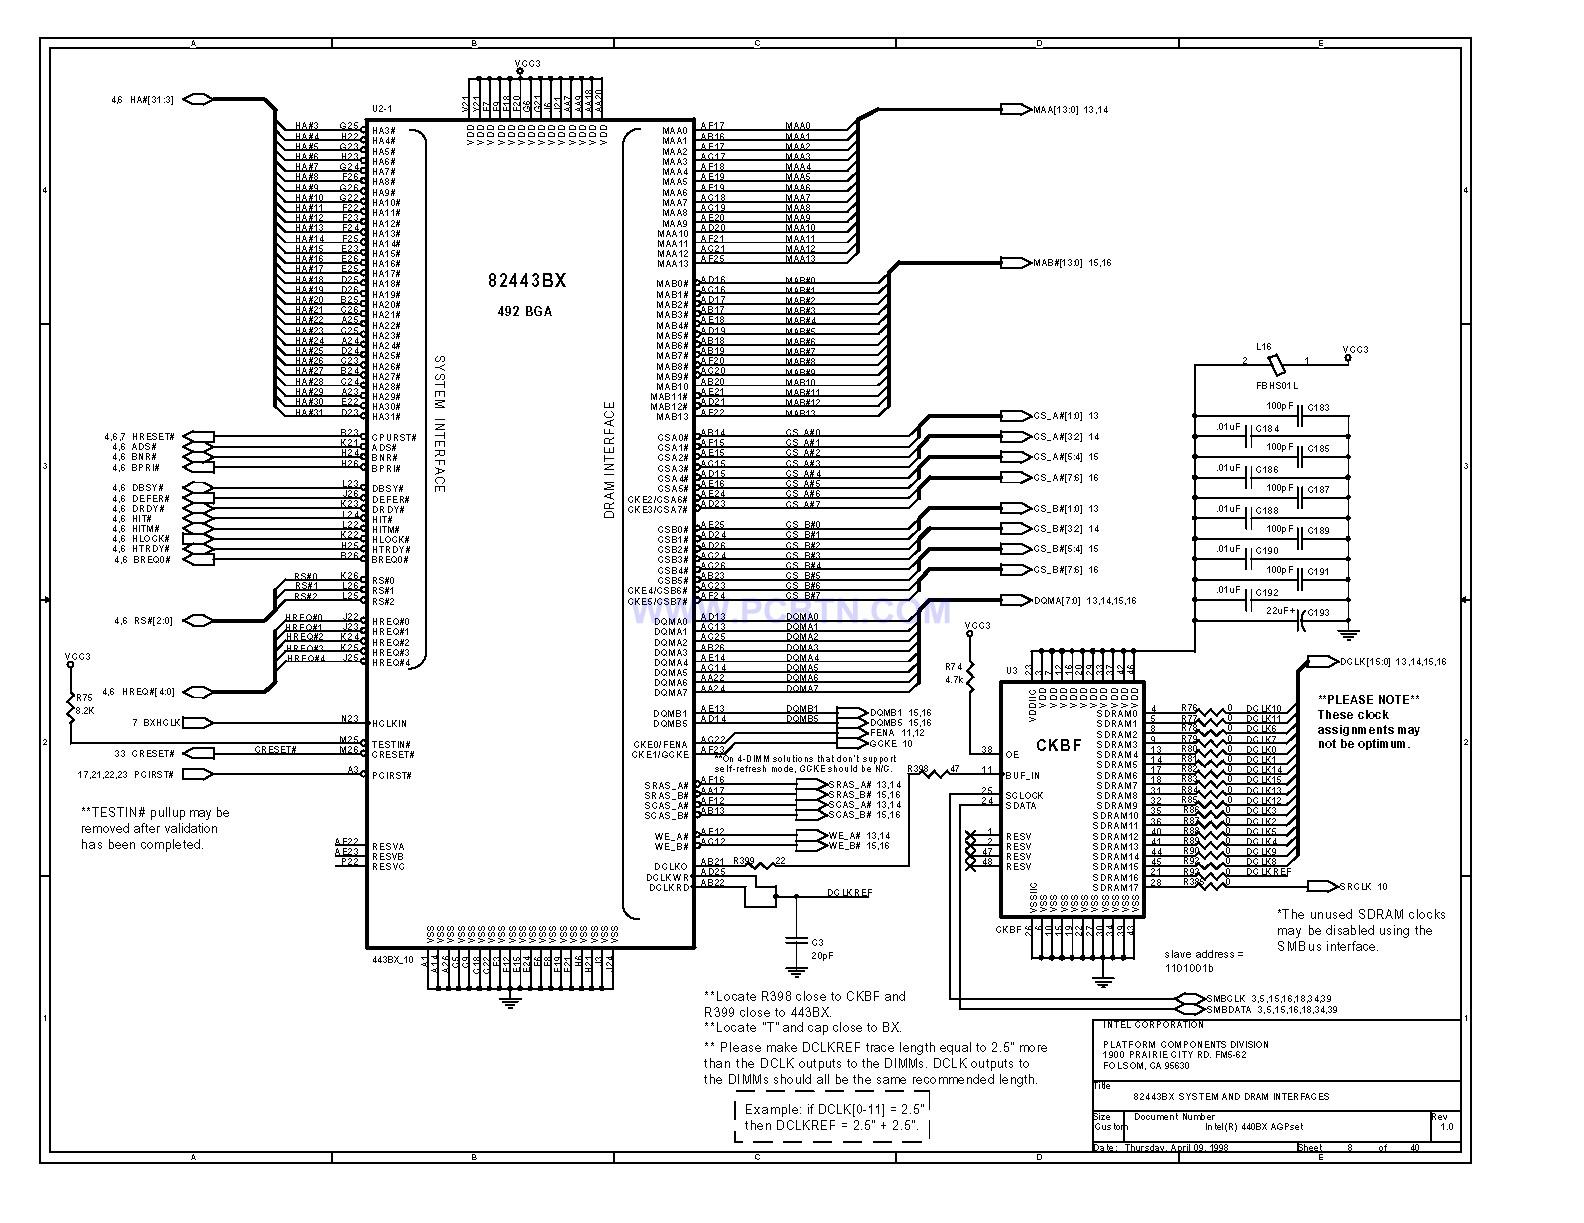 440BX芯片组是寿命最长的一款芯片组,也可以说是英特尔公司最成功的芯片组产品了,直到今天它还是芯片组市场的最大卖点。那么究竟原因何在呢?   原来这款440BX配合INTEL的Celeron CPU能发挥出极好的超频效果,而且它的价格也不昂贵,所以它从问世到两年后的今天一直被广大DIY爱好者所喜爱.